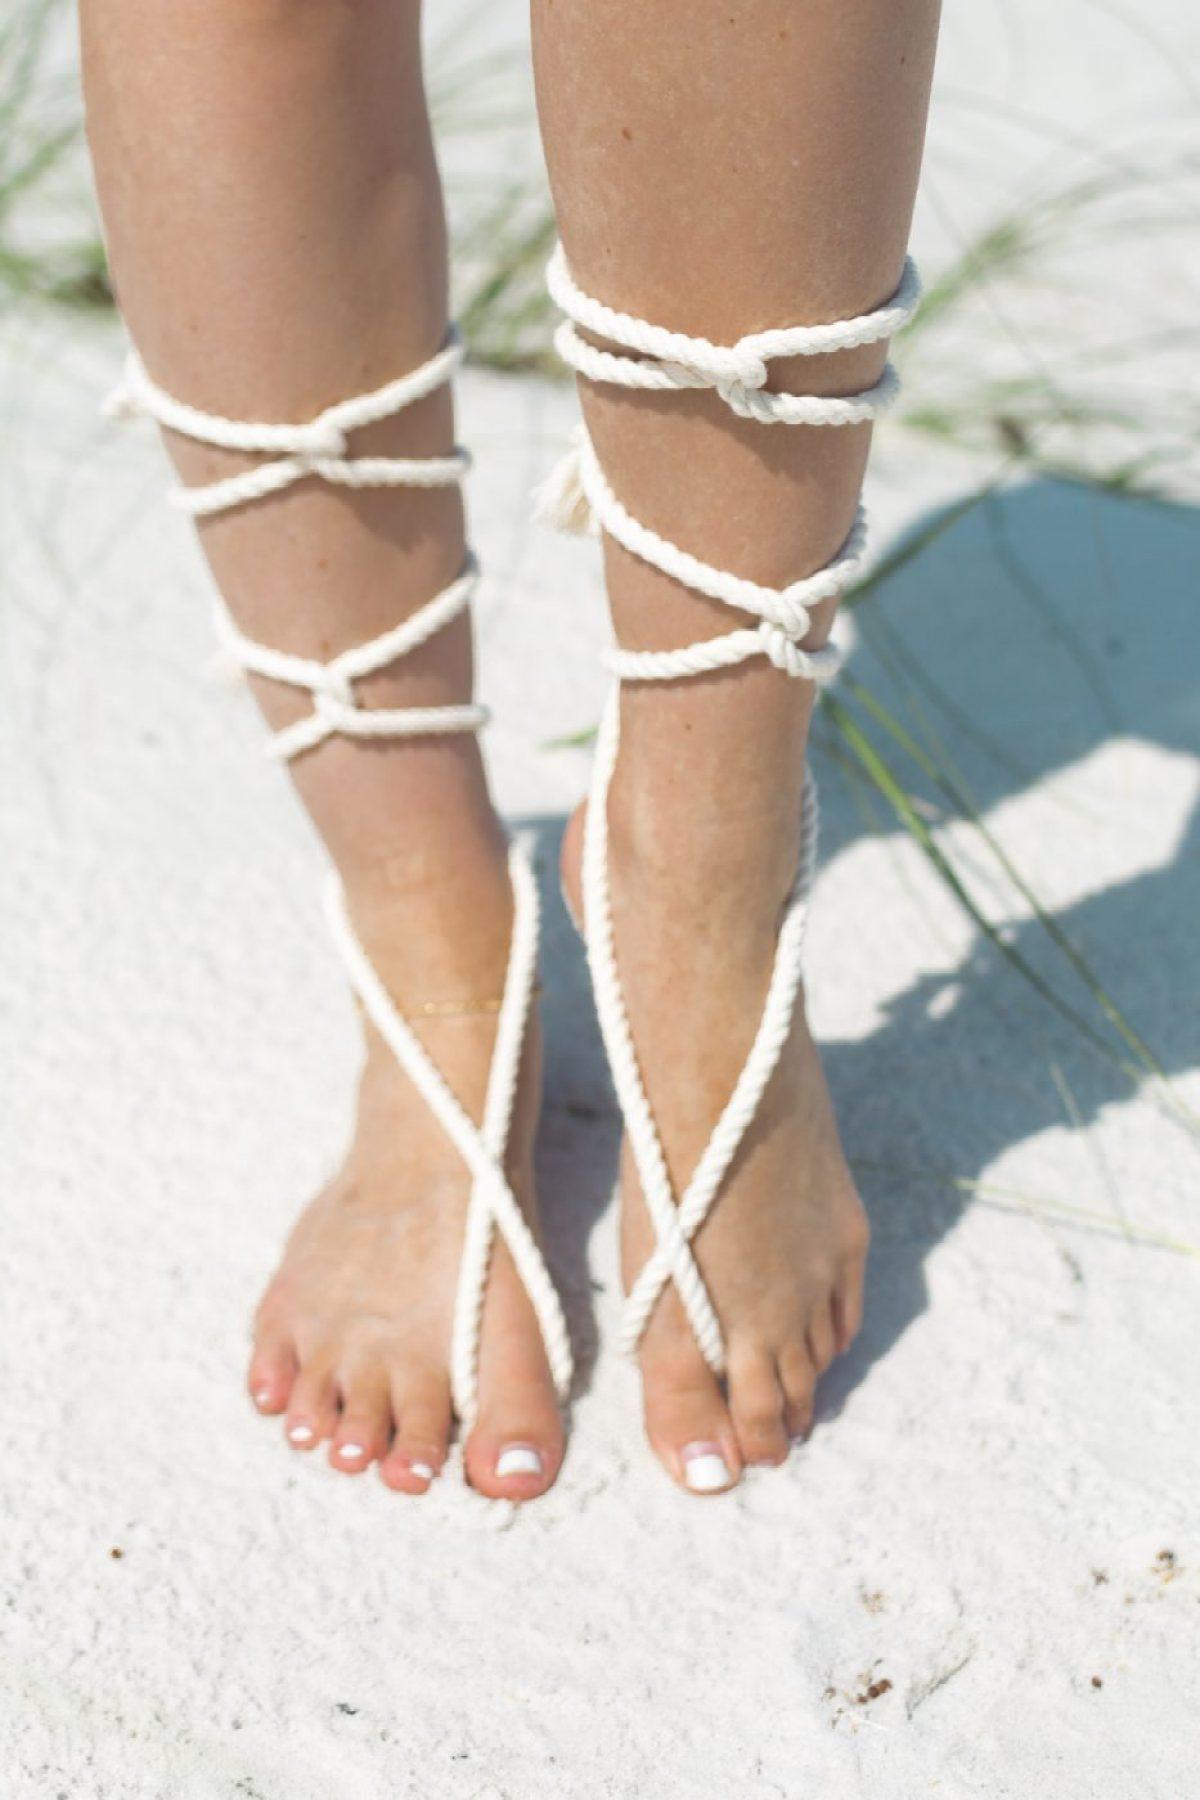 DIY Rope Barefoot Sandals